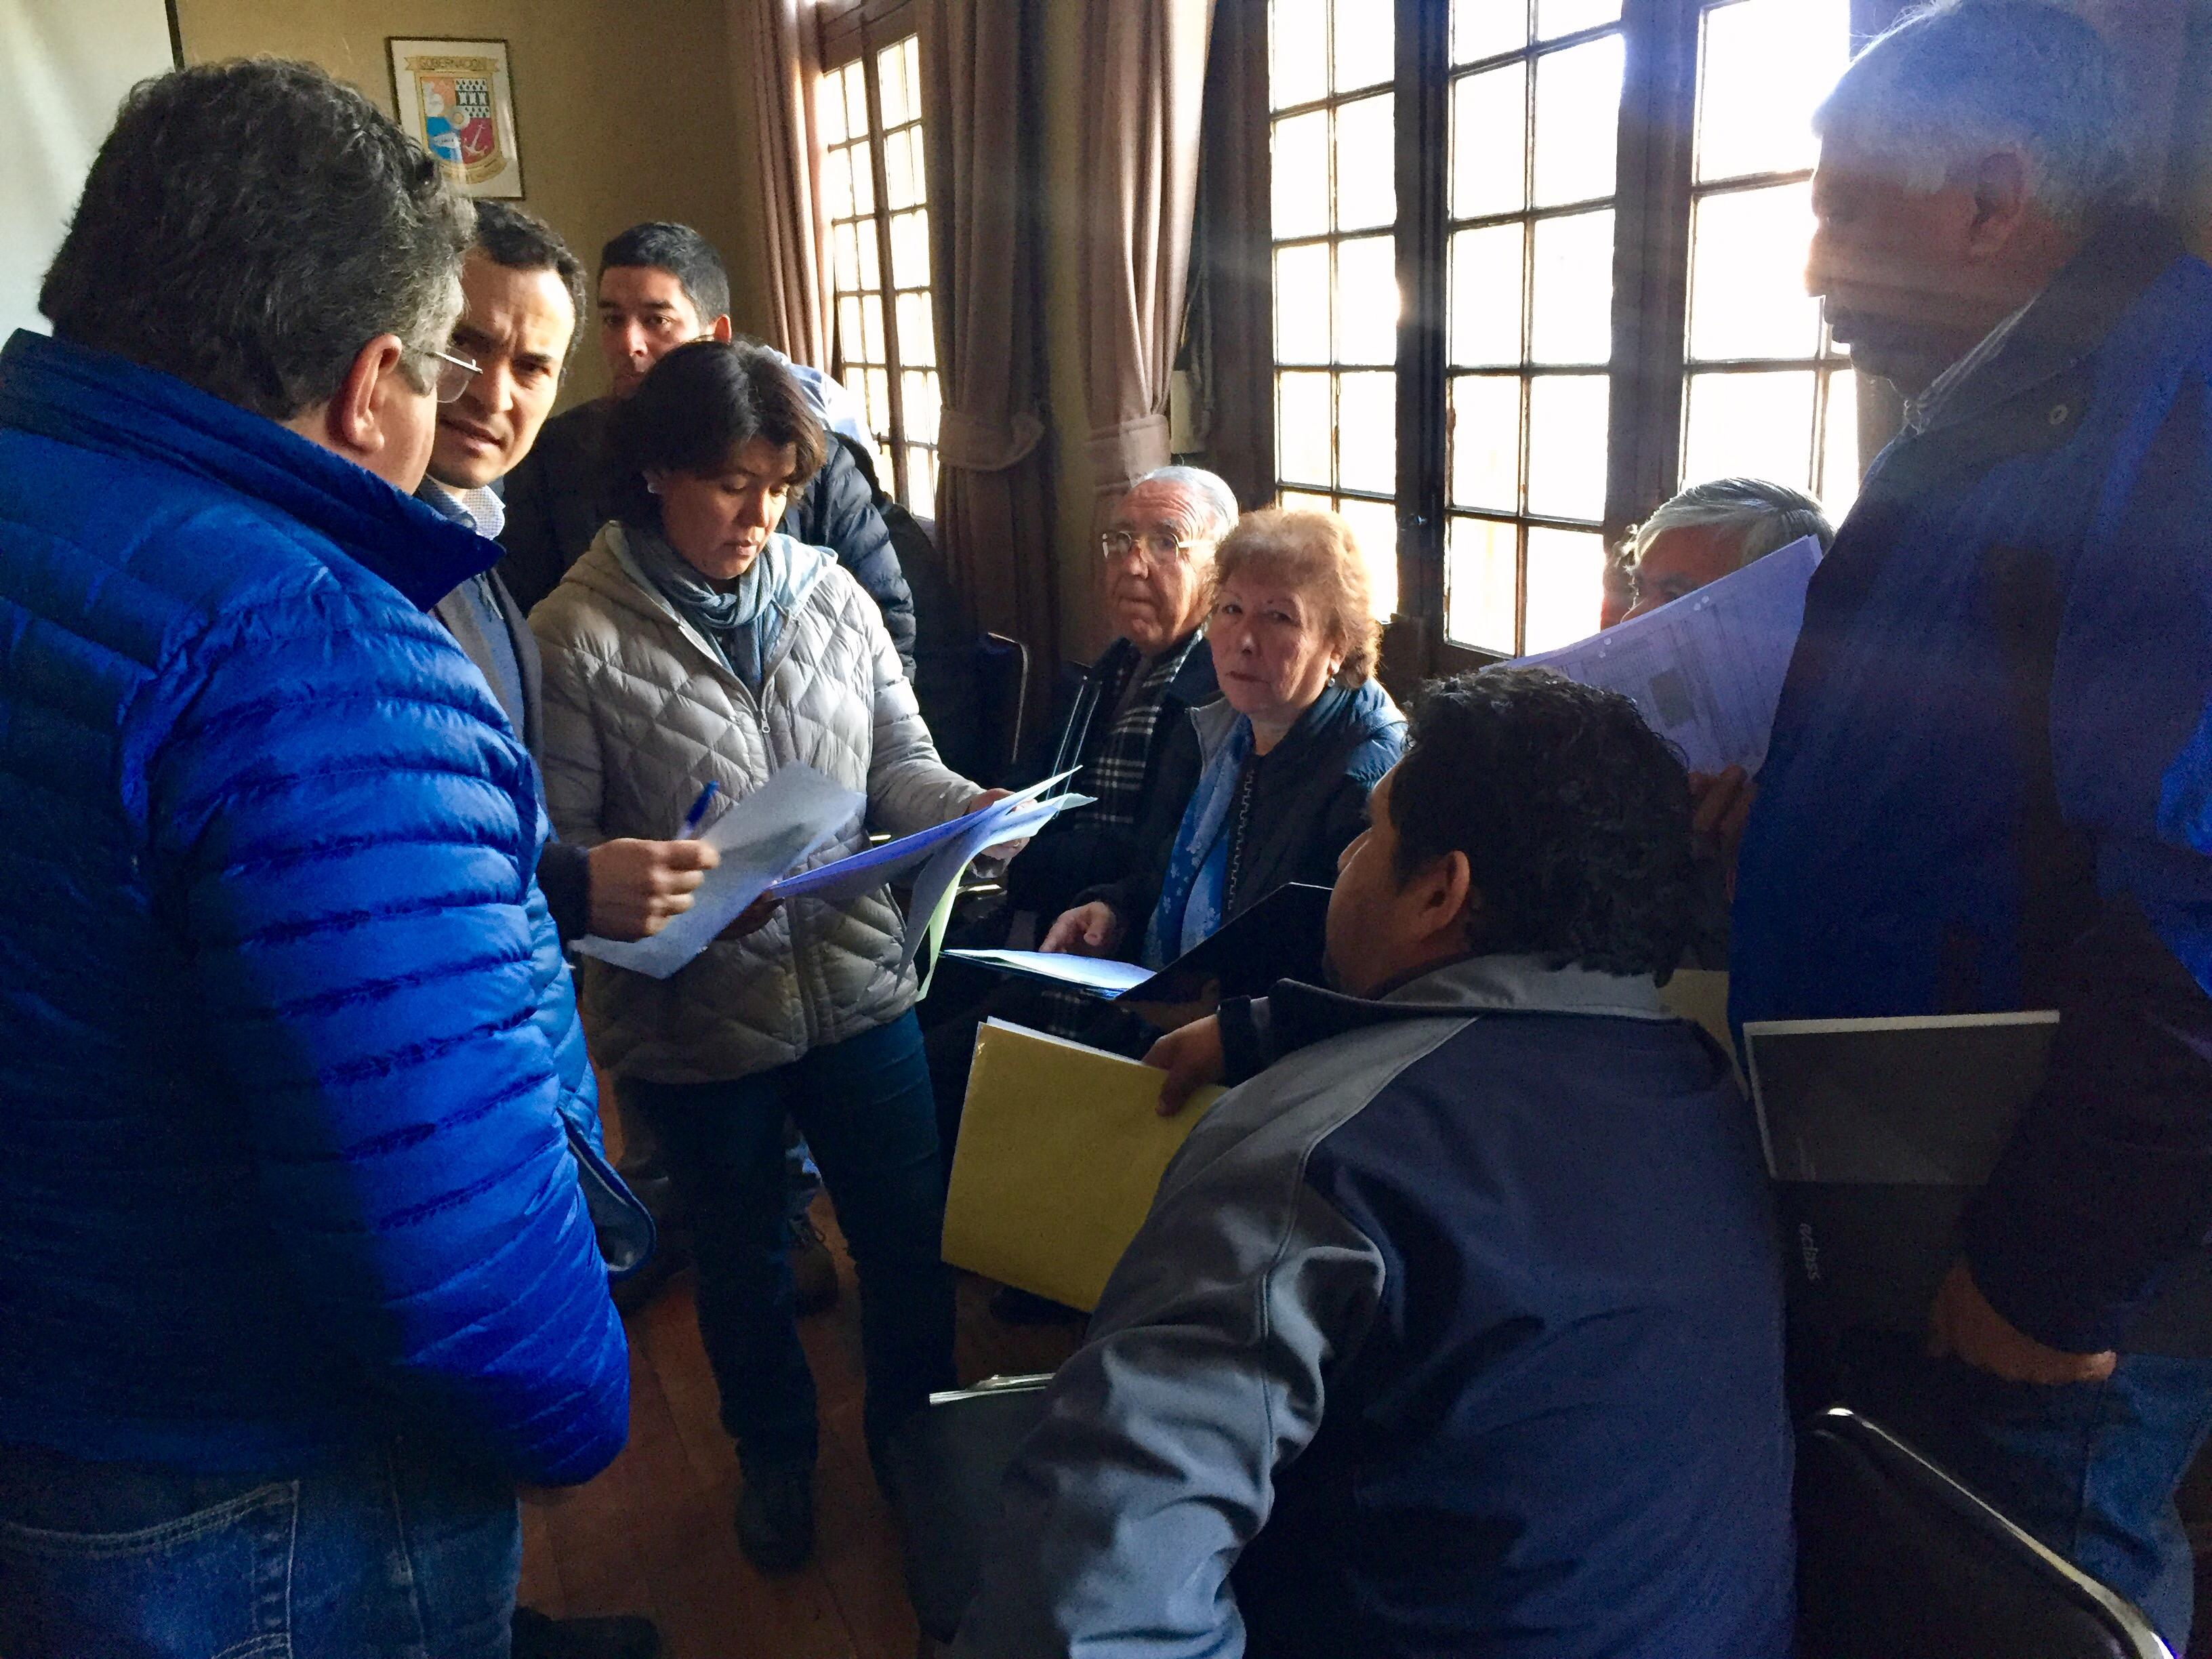 Interchile inició pagos a proveedores del Huasco tras denuncia